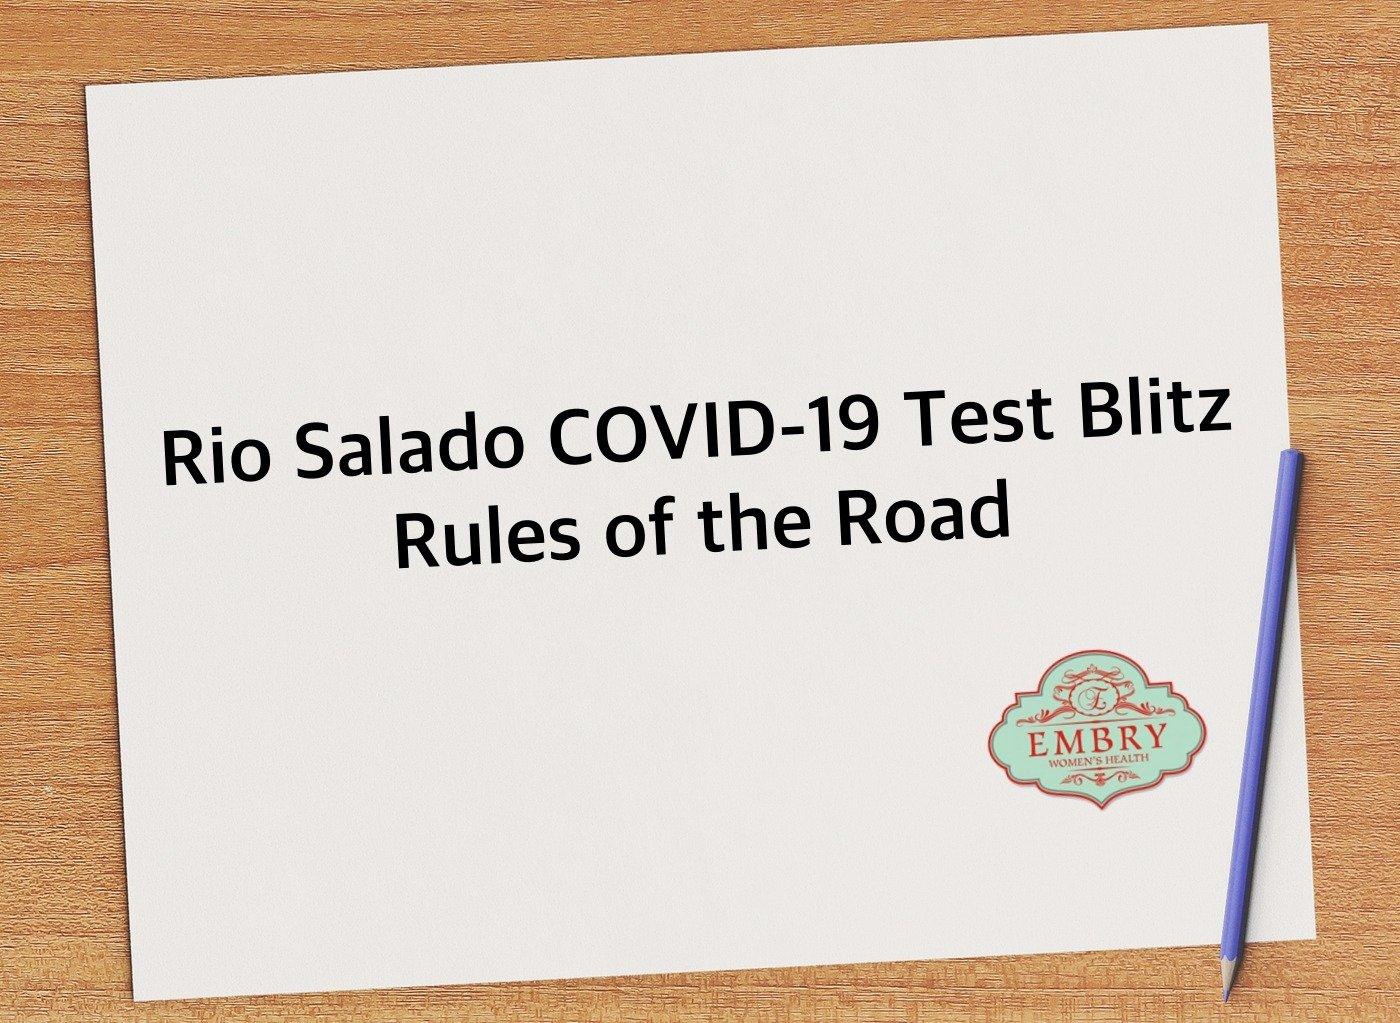 Rio Salado COVID-19 Test Blitz Rules of the Road